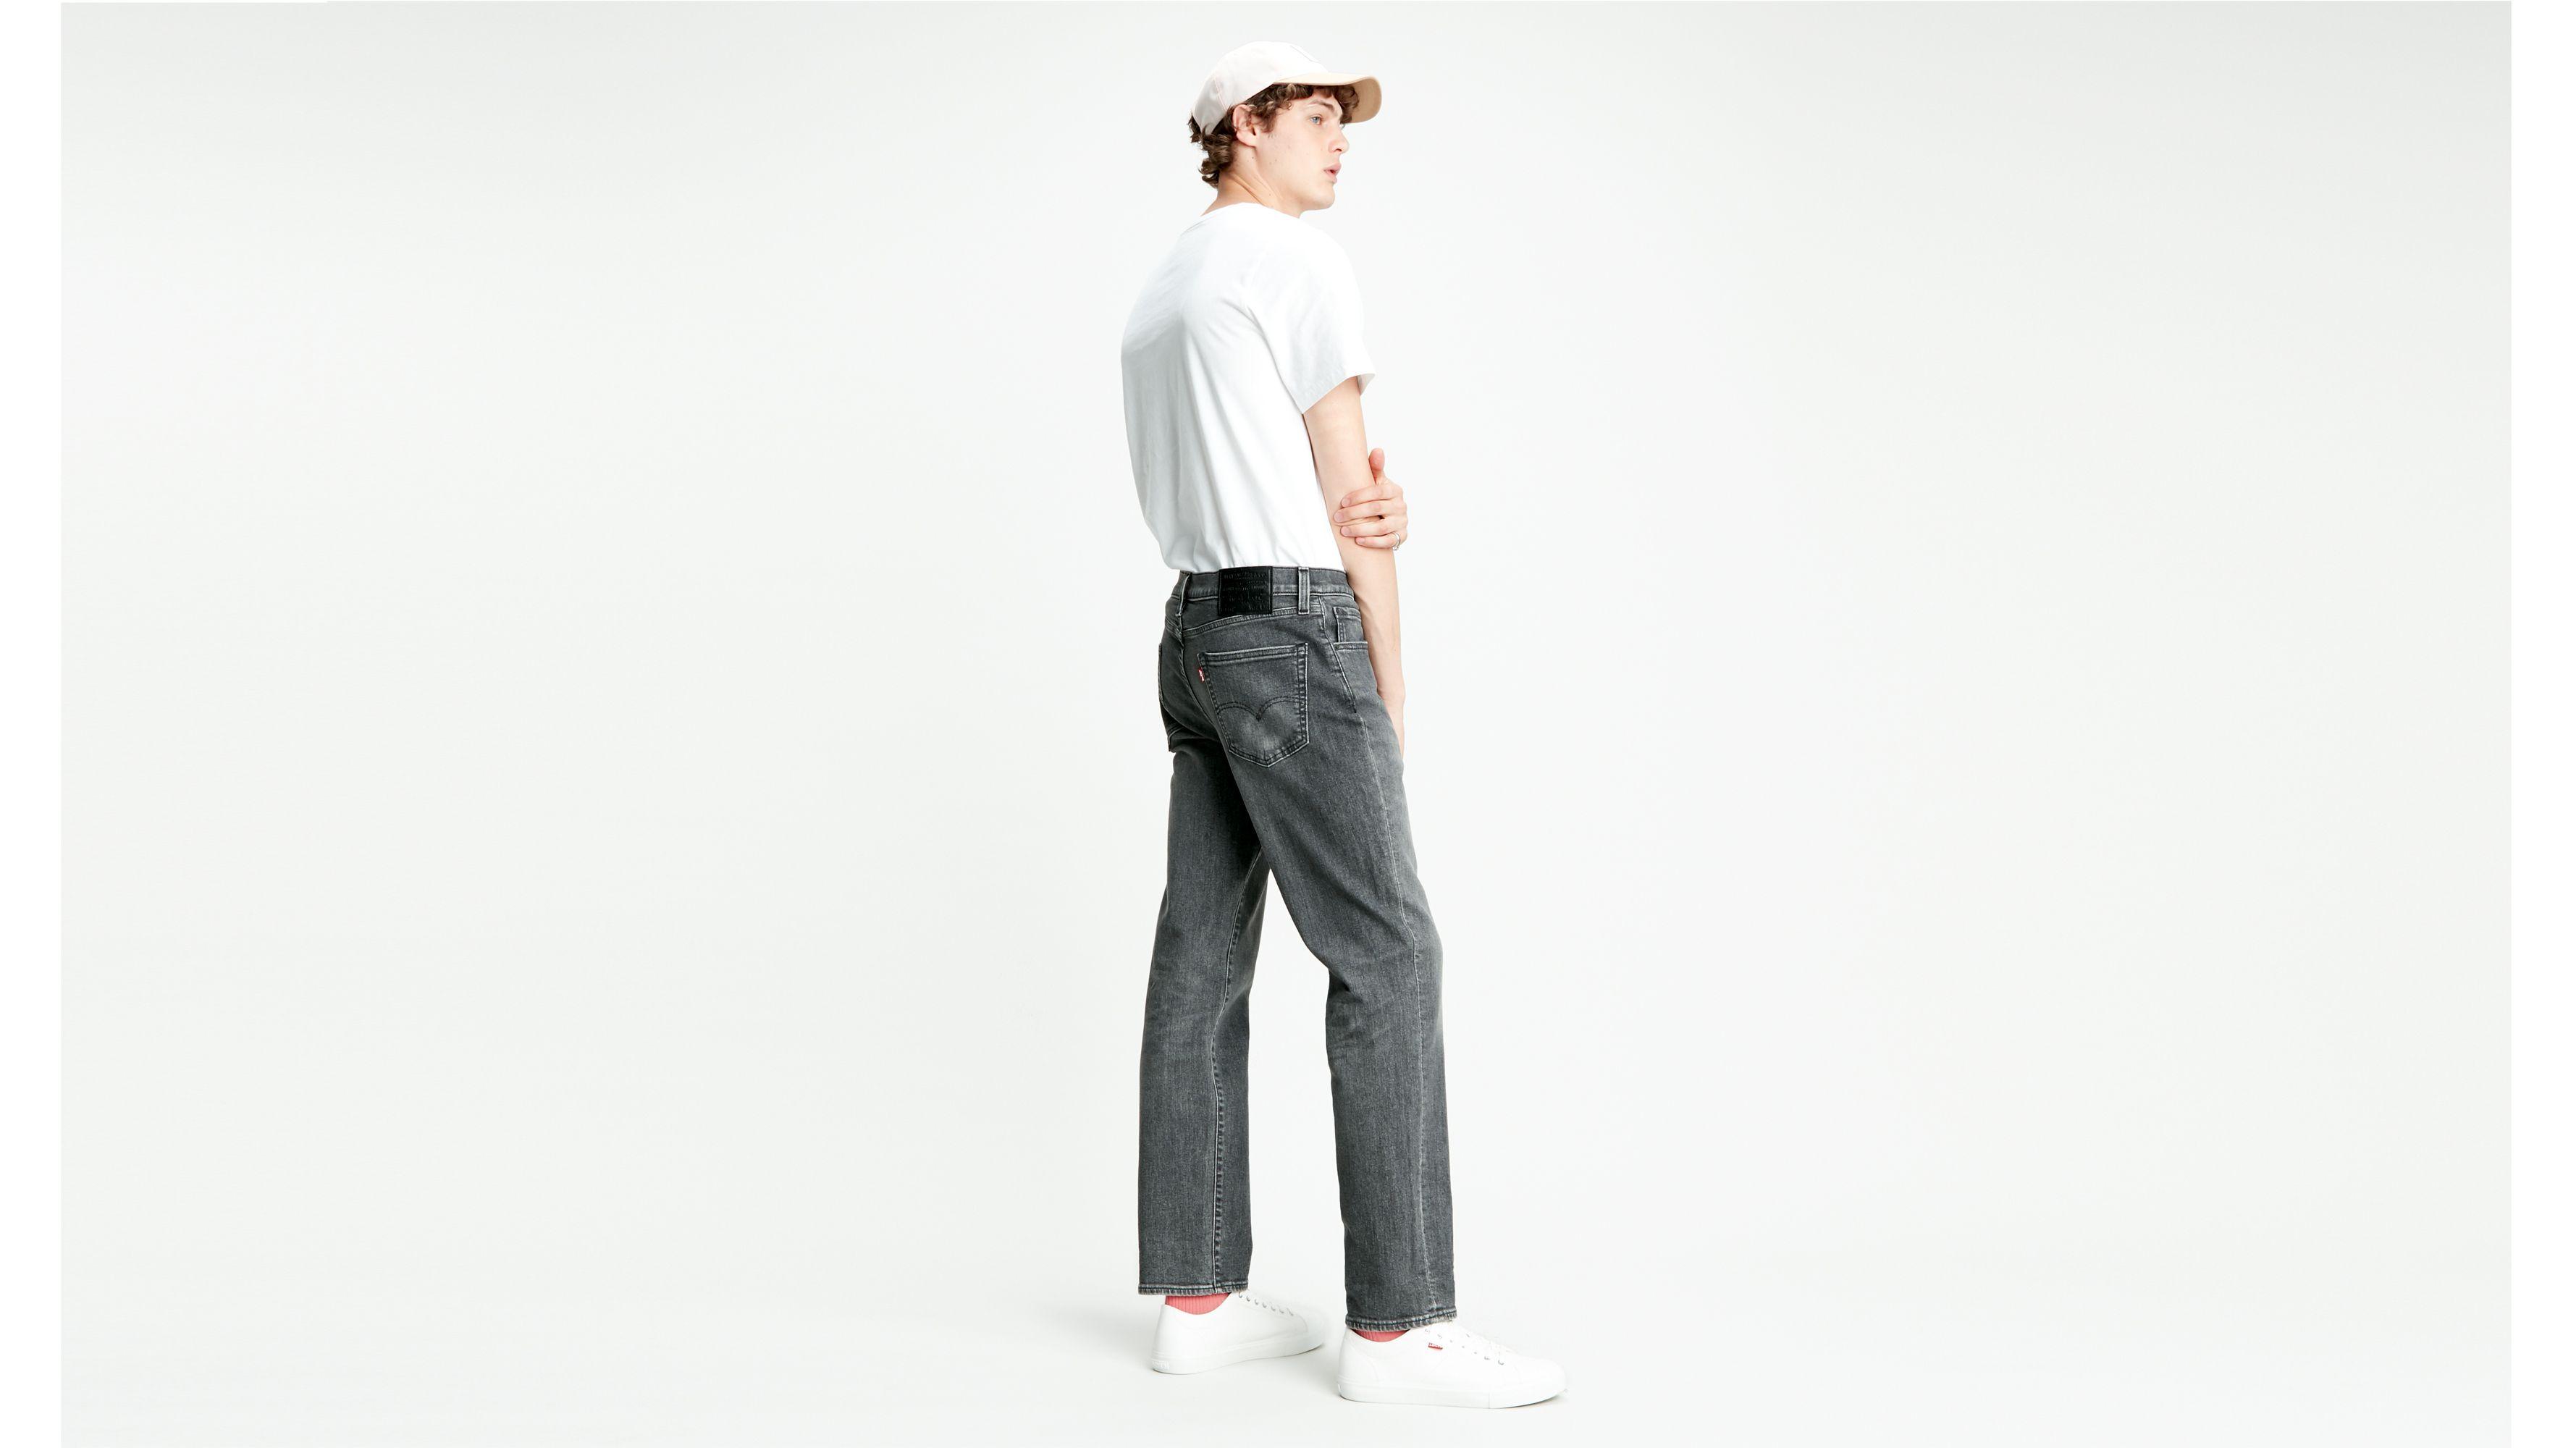 NUOVA linea uomo regular fit straight leg jeans denim Pantaloni Girovita Taglia 30 32 34 36 38